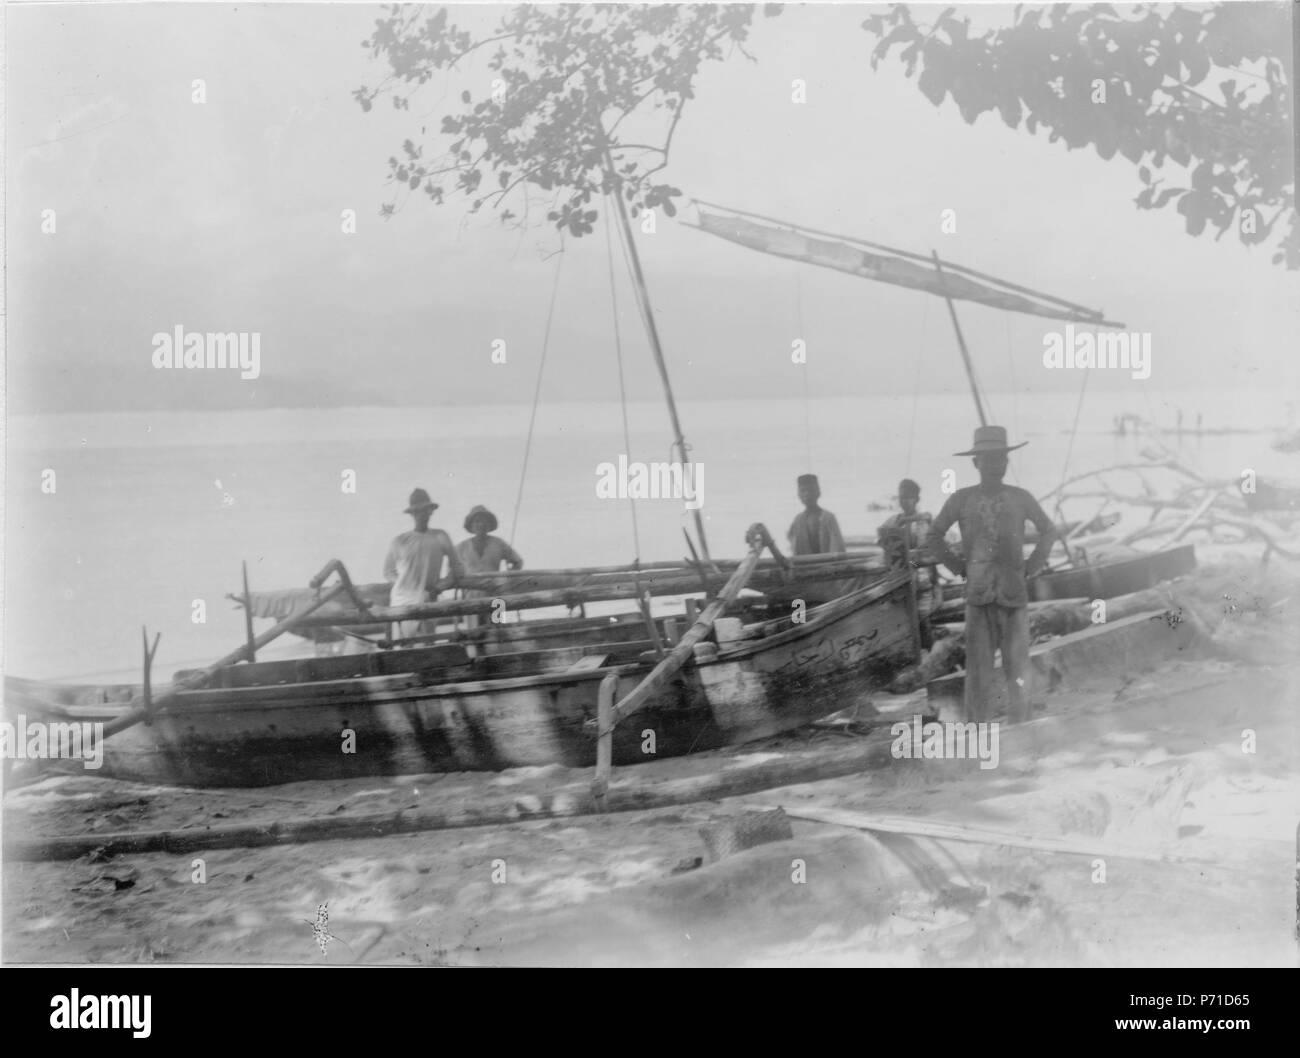 7 Båtar vid stranden. Sulawesi. Indonesien - SMVK - 000308 - Stock Image